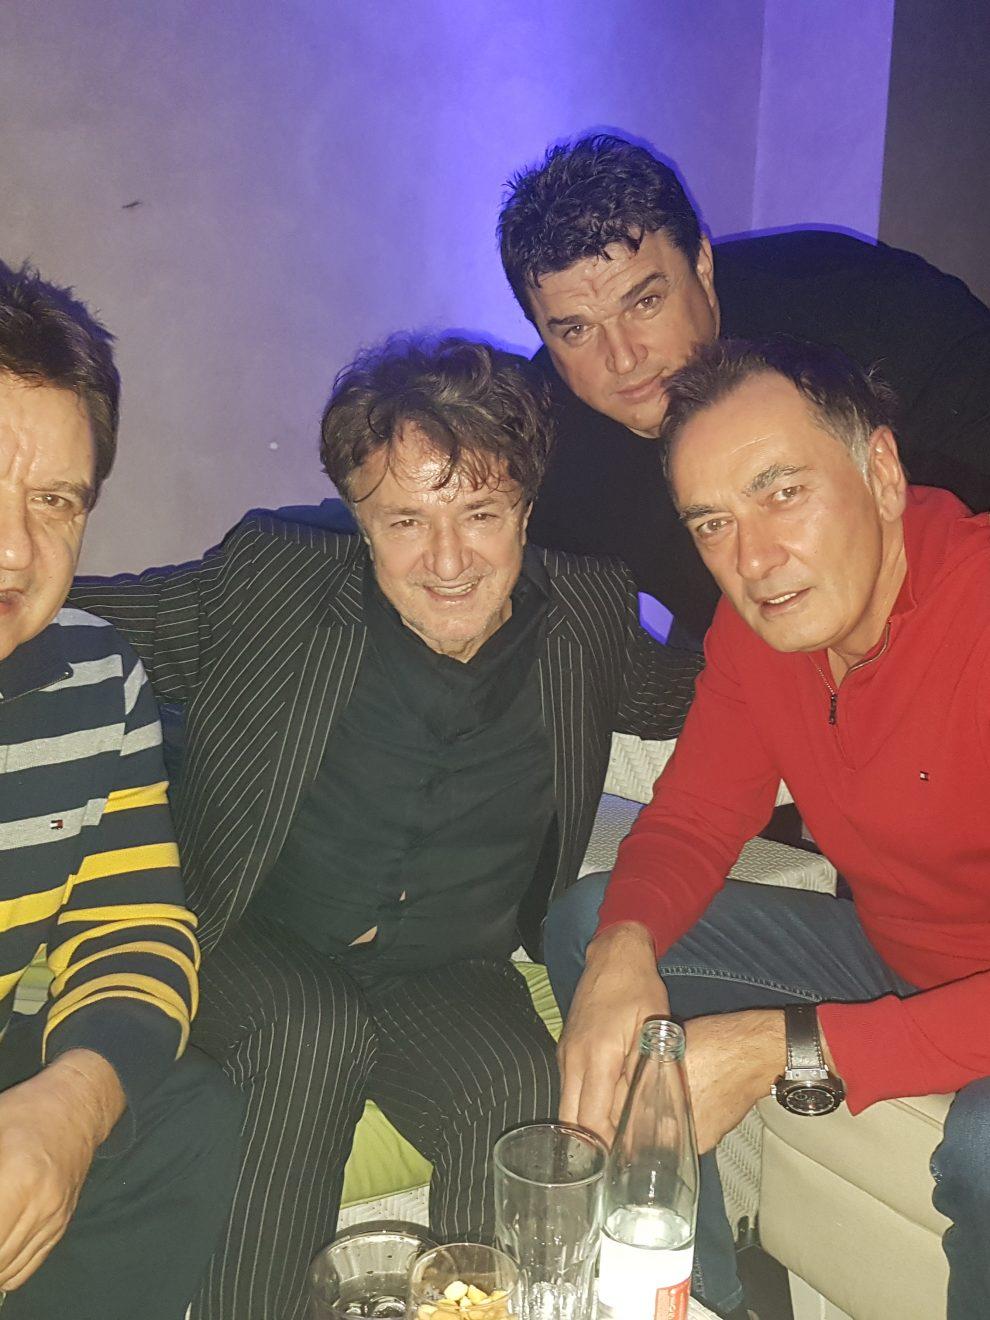 Goran Bregovic u nocnom provodu sa Senadom Hadzifejzovicem i Elvirom Bolicem